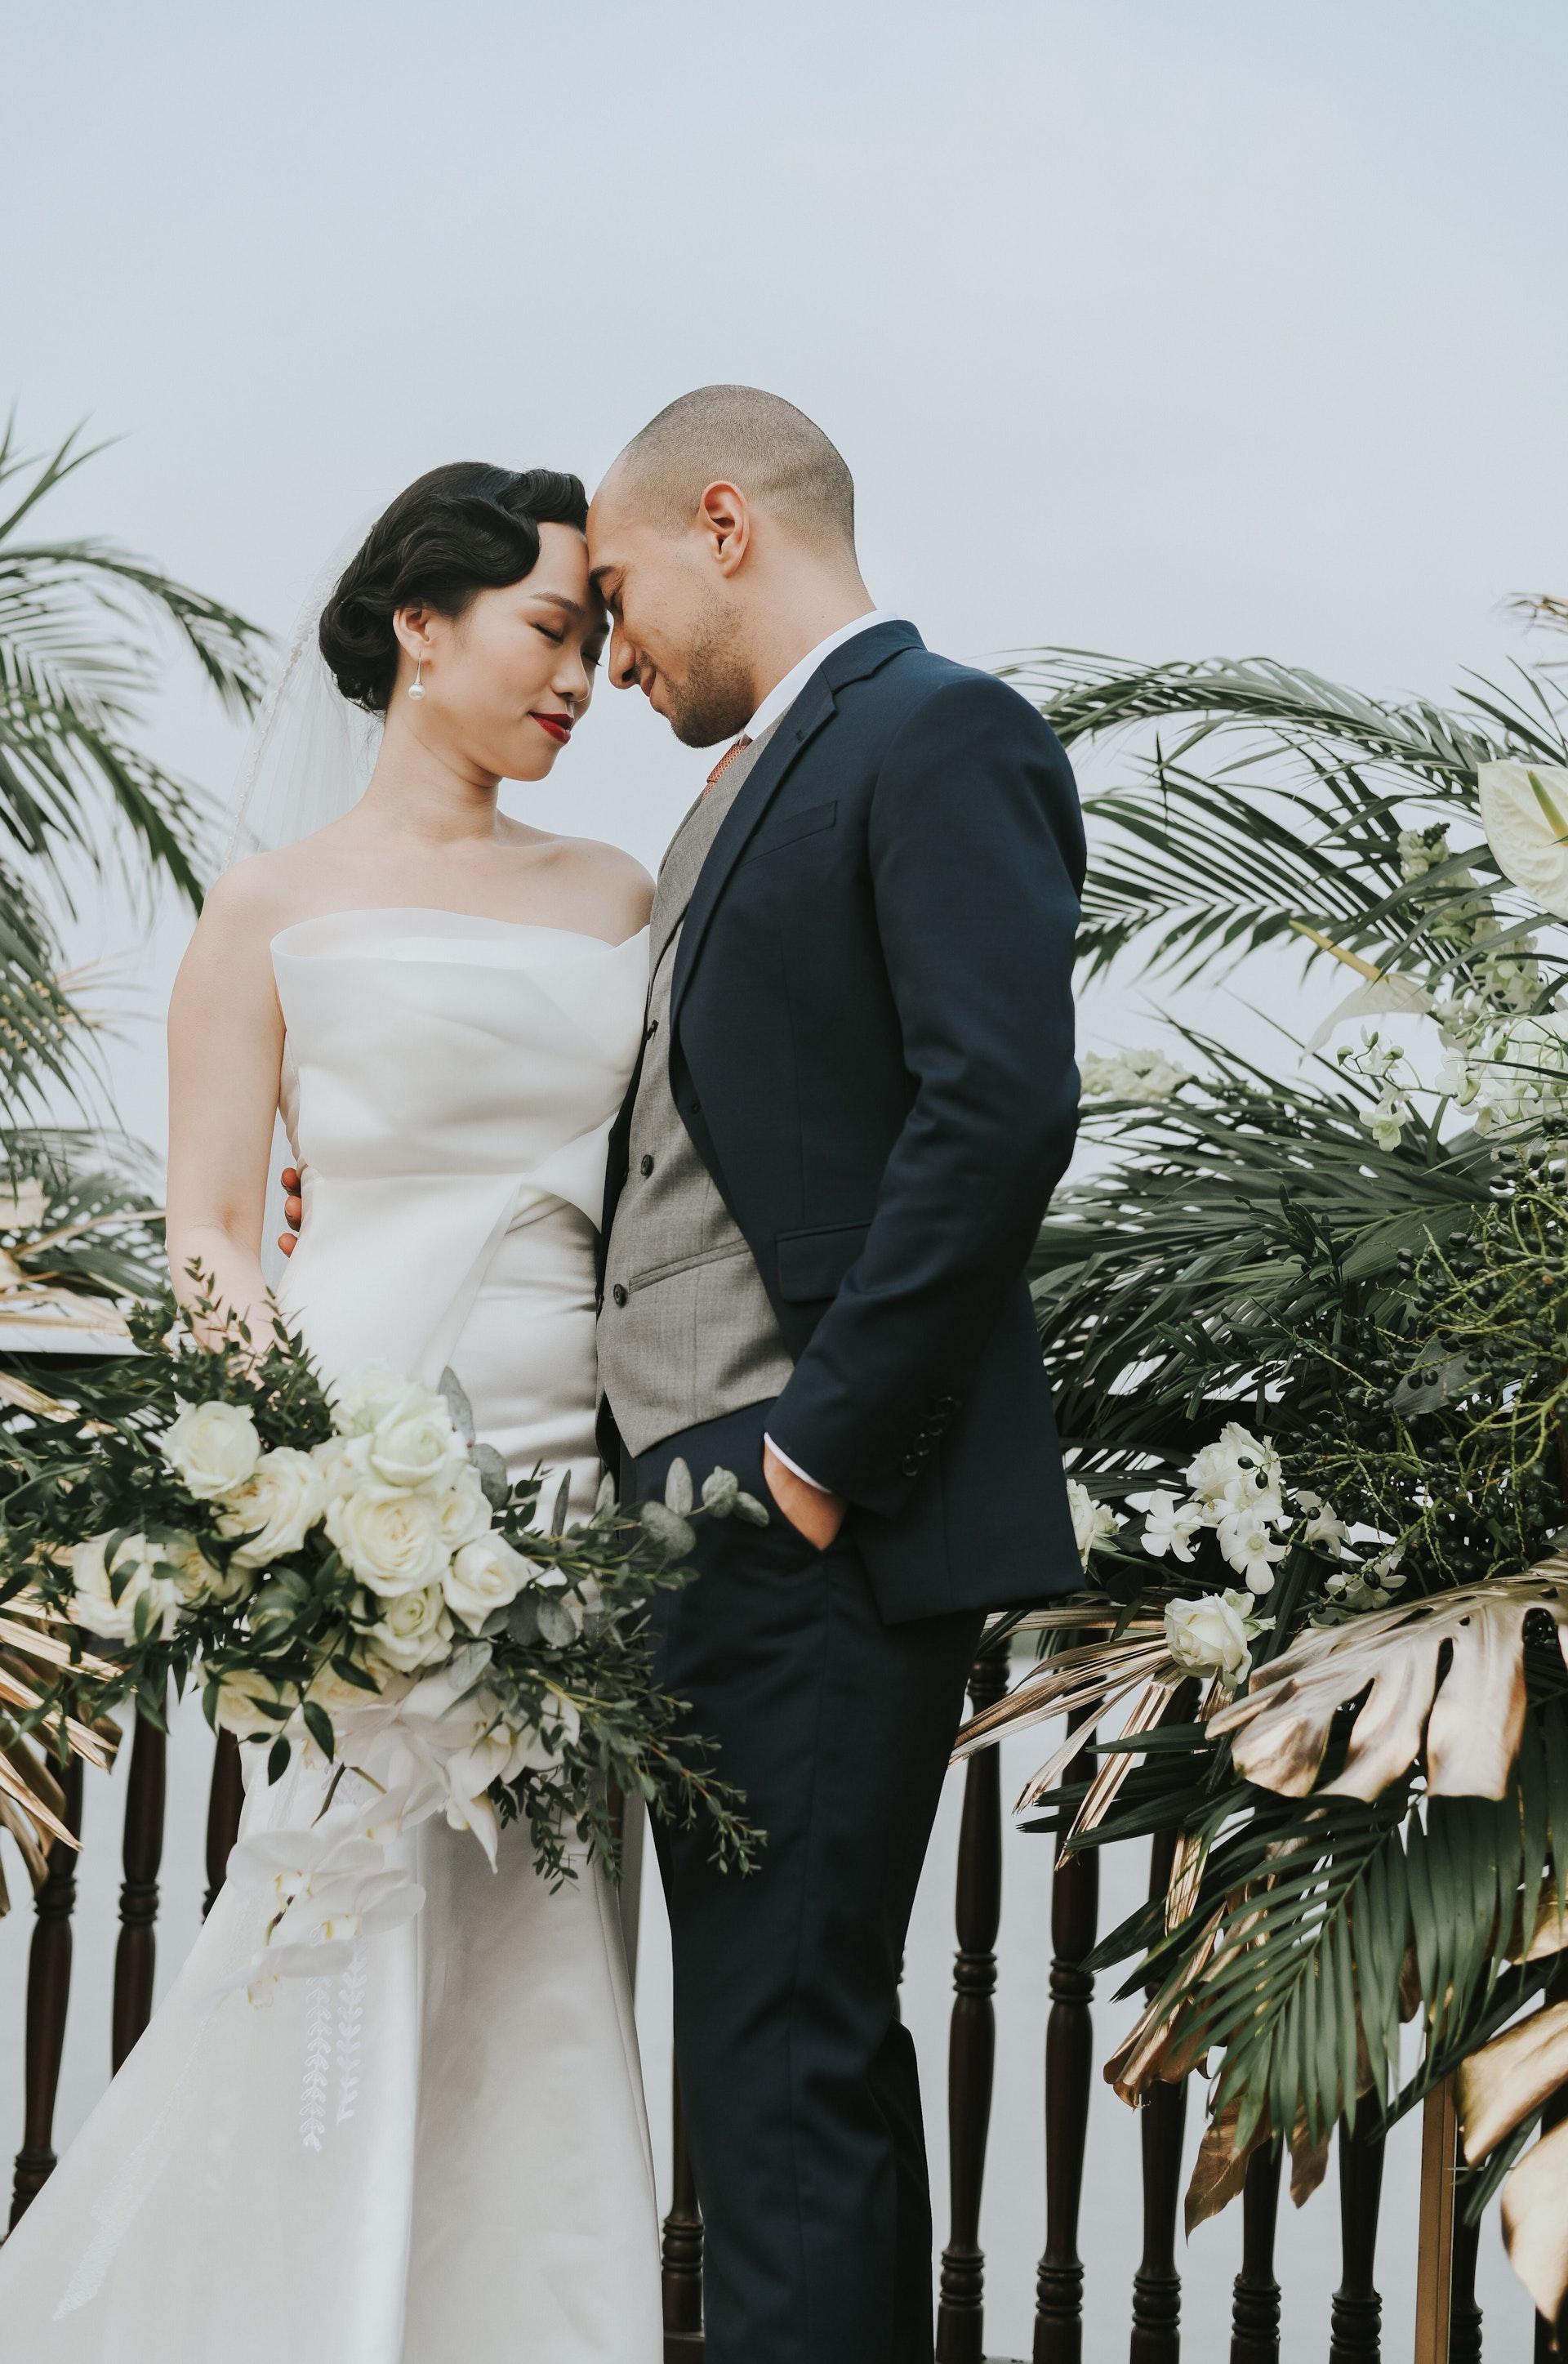 Meraki wedding planner